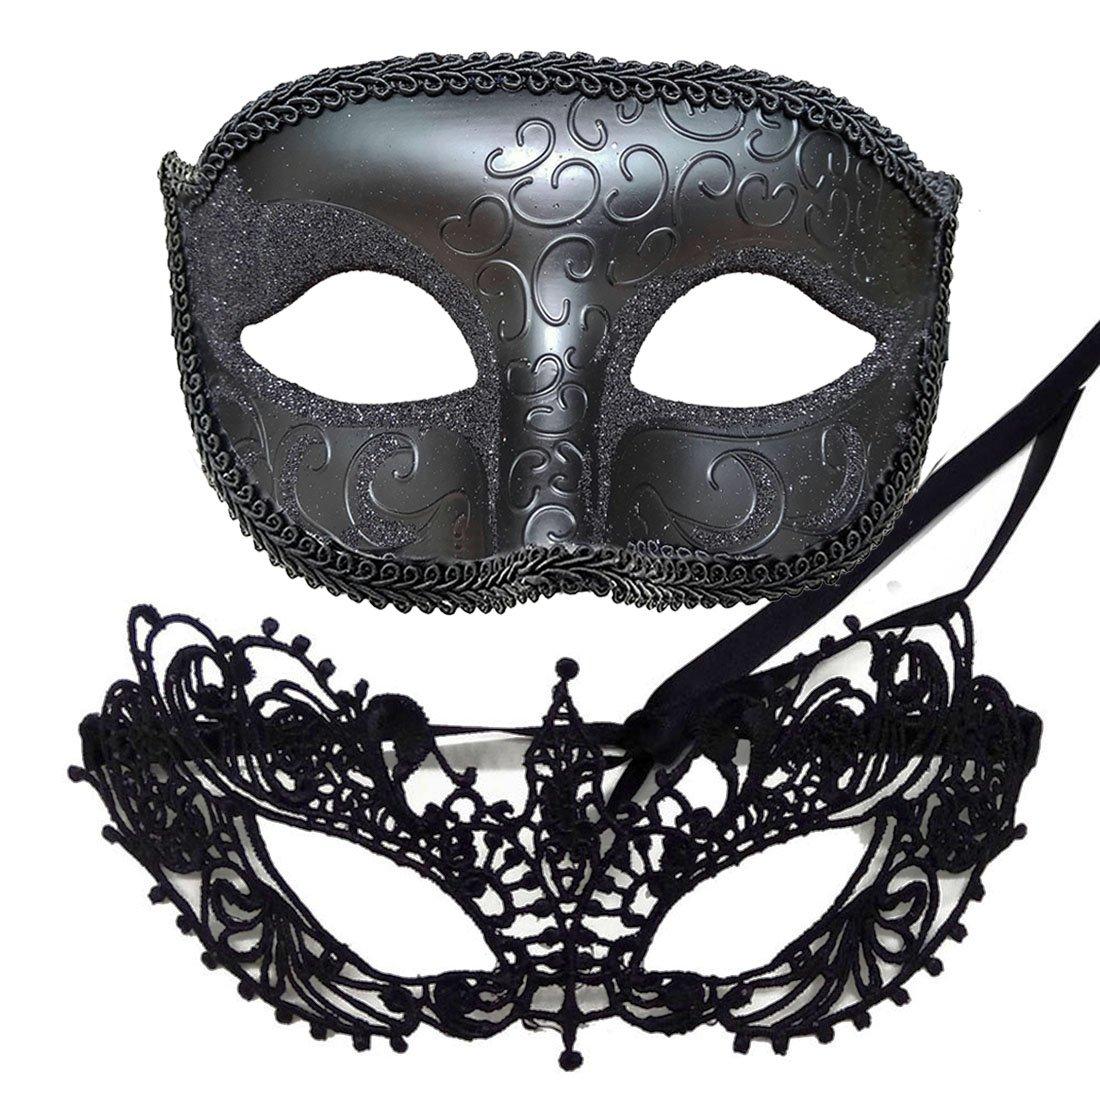 IDOXE Fashion Lace Couple Masquerade Masks Venetian Women Men Mask for Halloween/Party / Ball Prom/Mardi Gras/Wedding / Wall Decoration